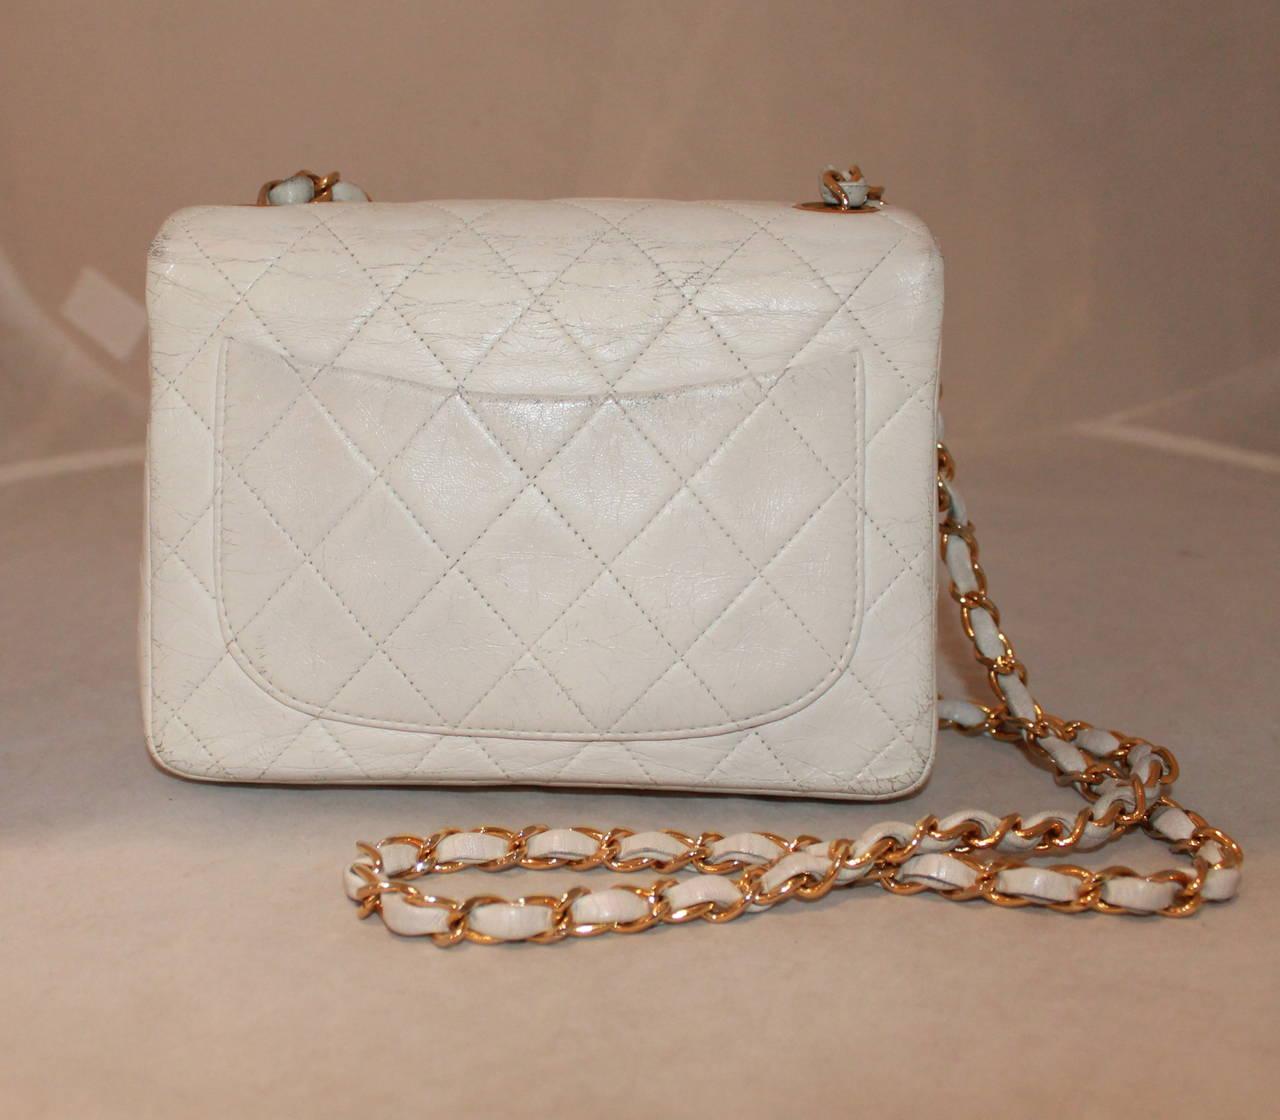 Chanel White Leather Classic Small Handbag - circa 2006 at 1stdibs